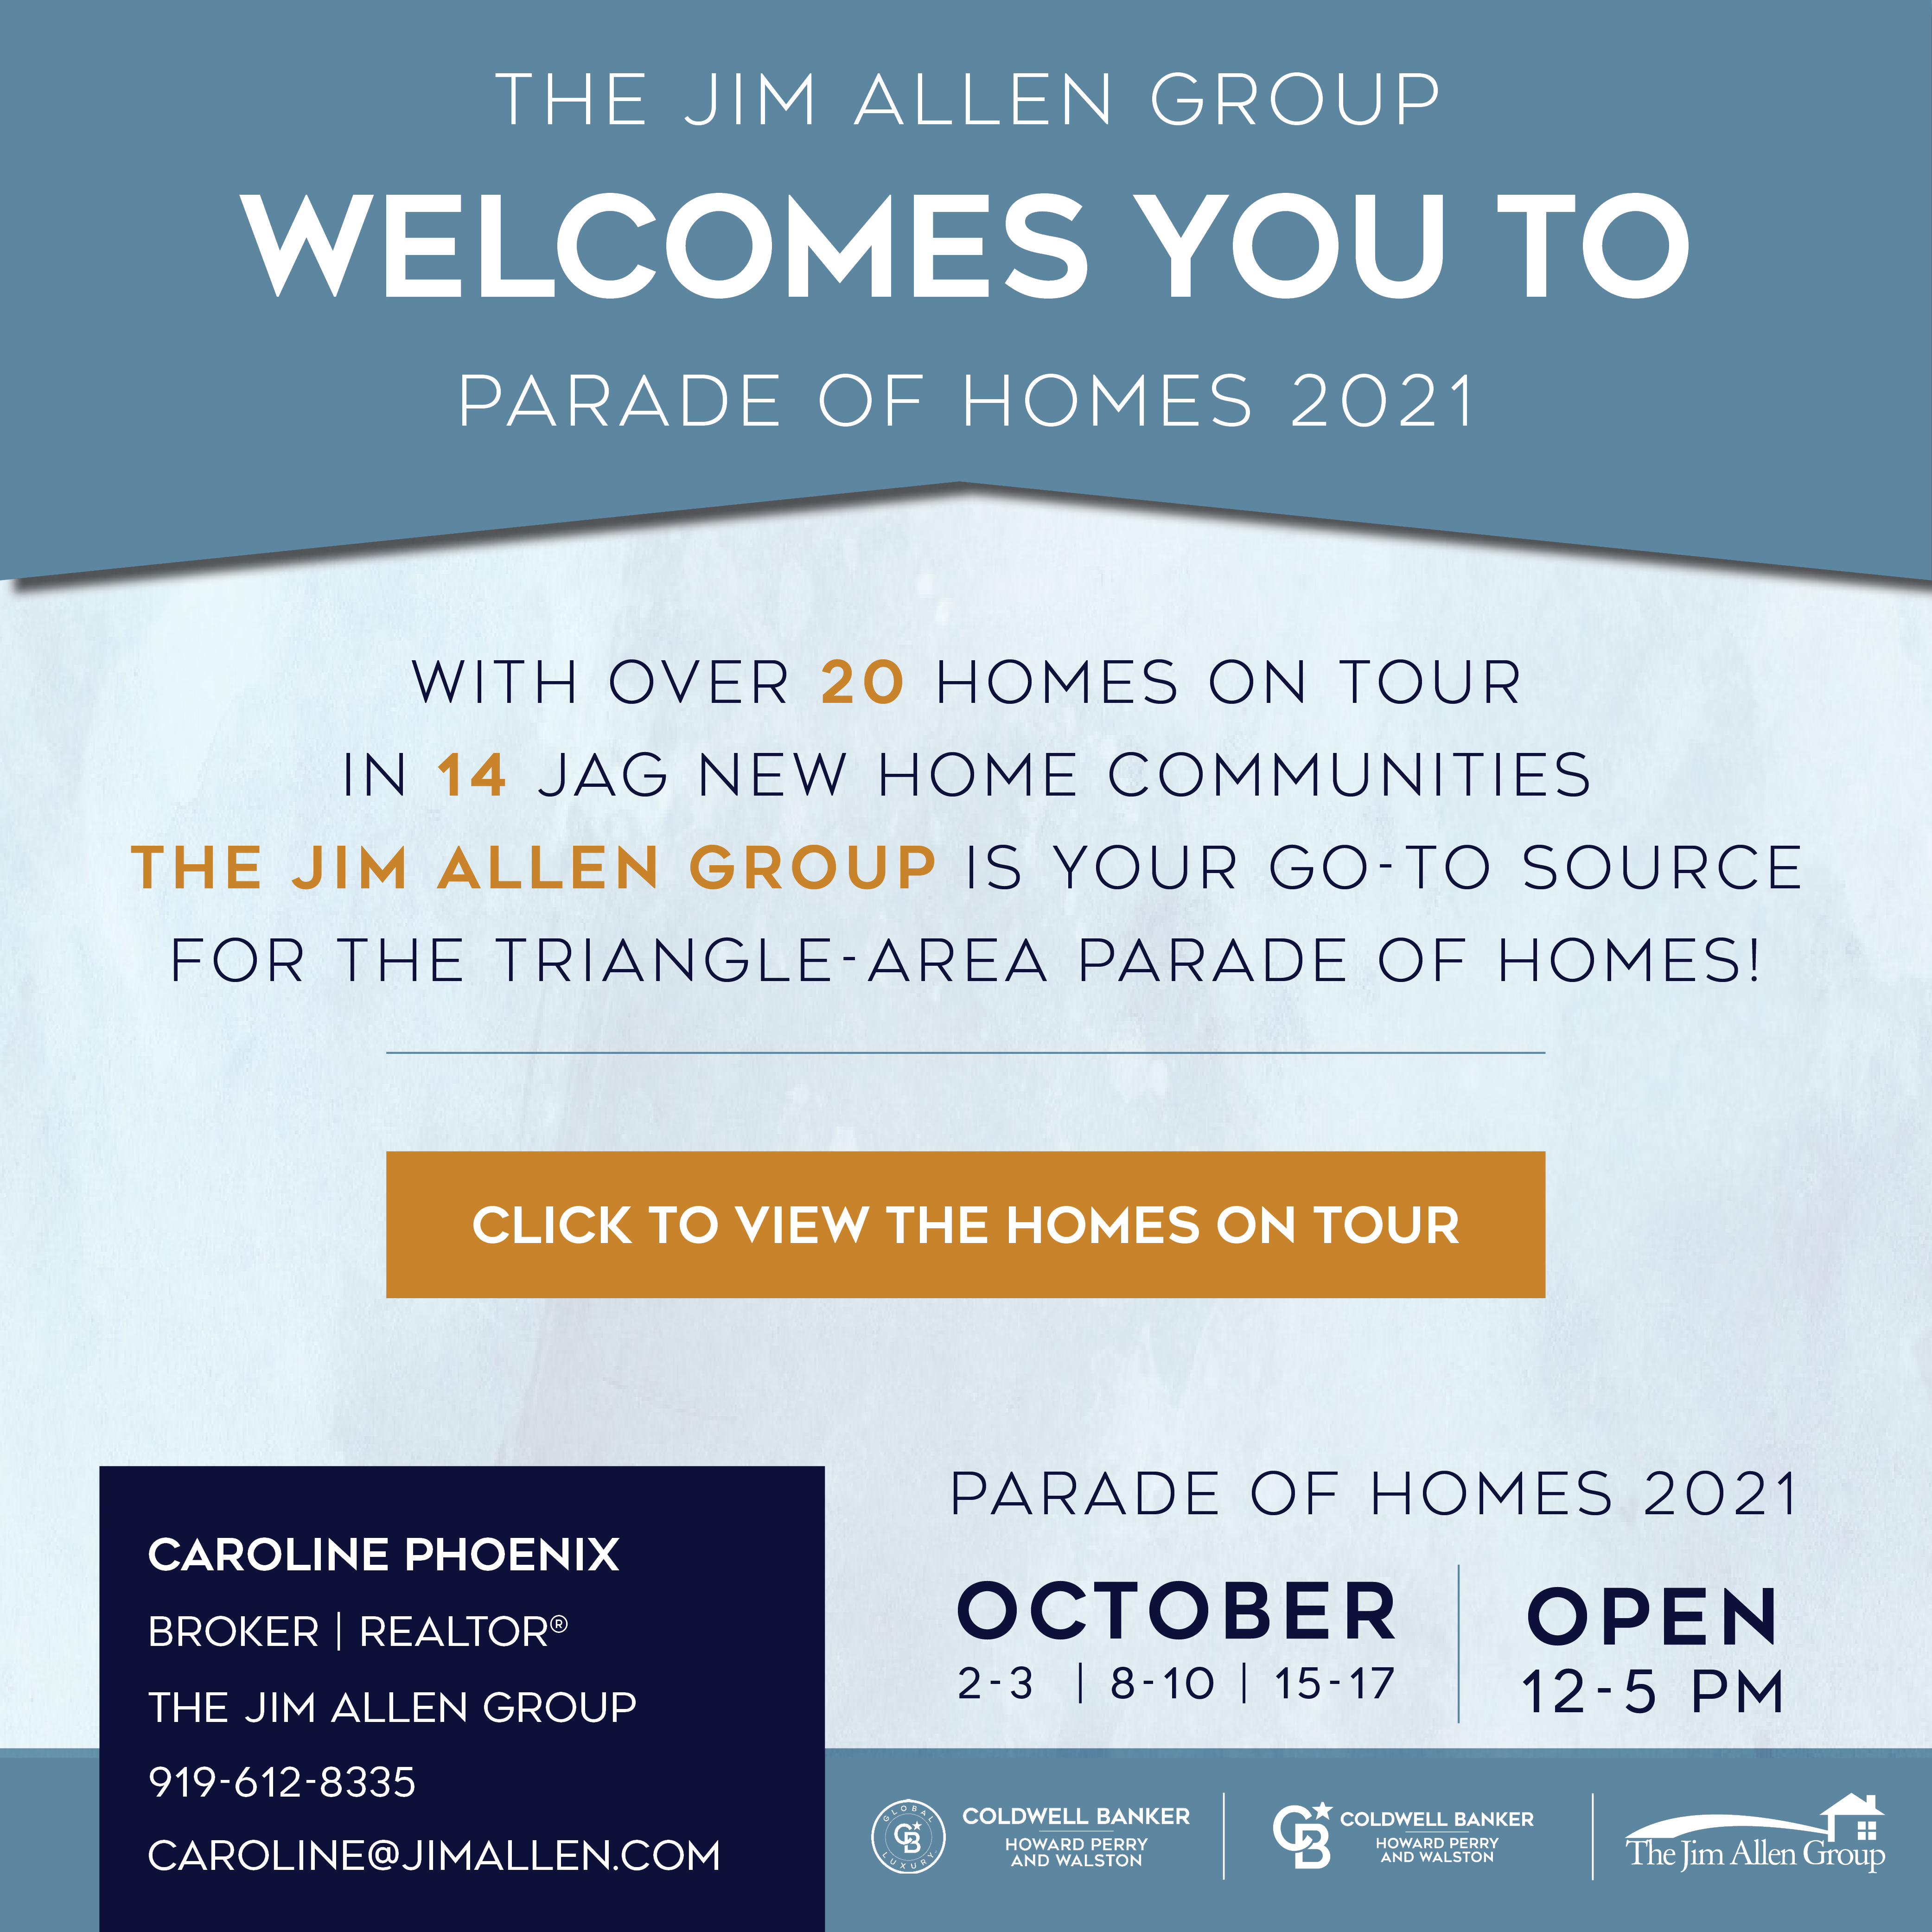 Caroline Phoenix | Parade of Homes 2021 | The Jim Allen Group